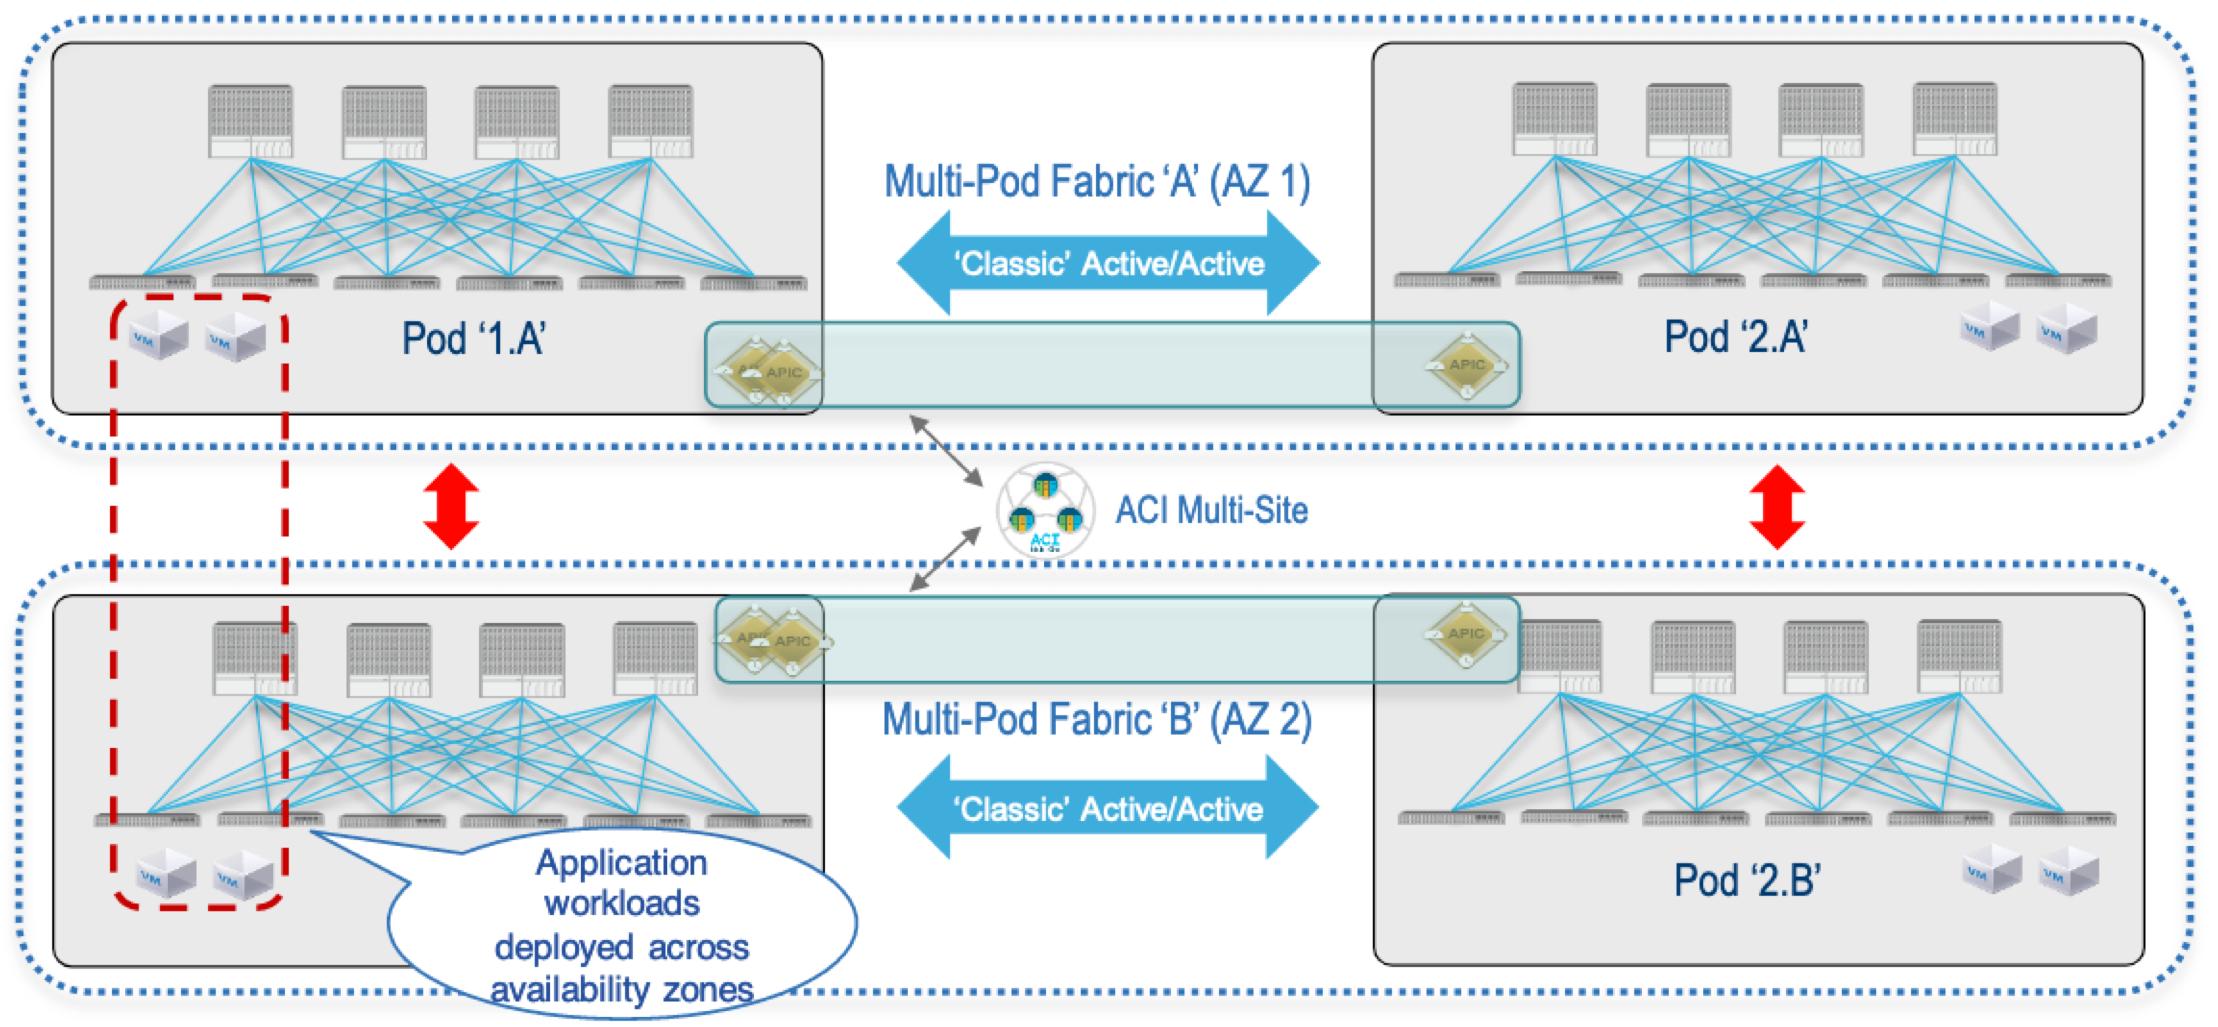 Multi-Pod & Multi-Site Together